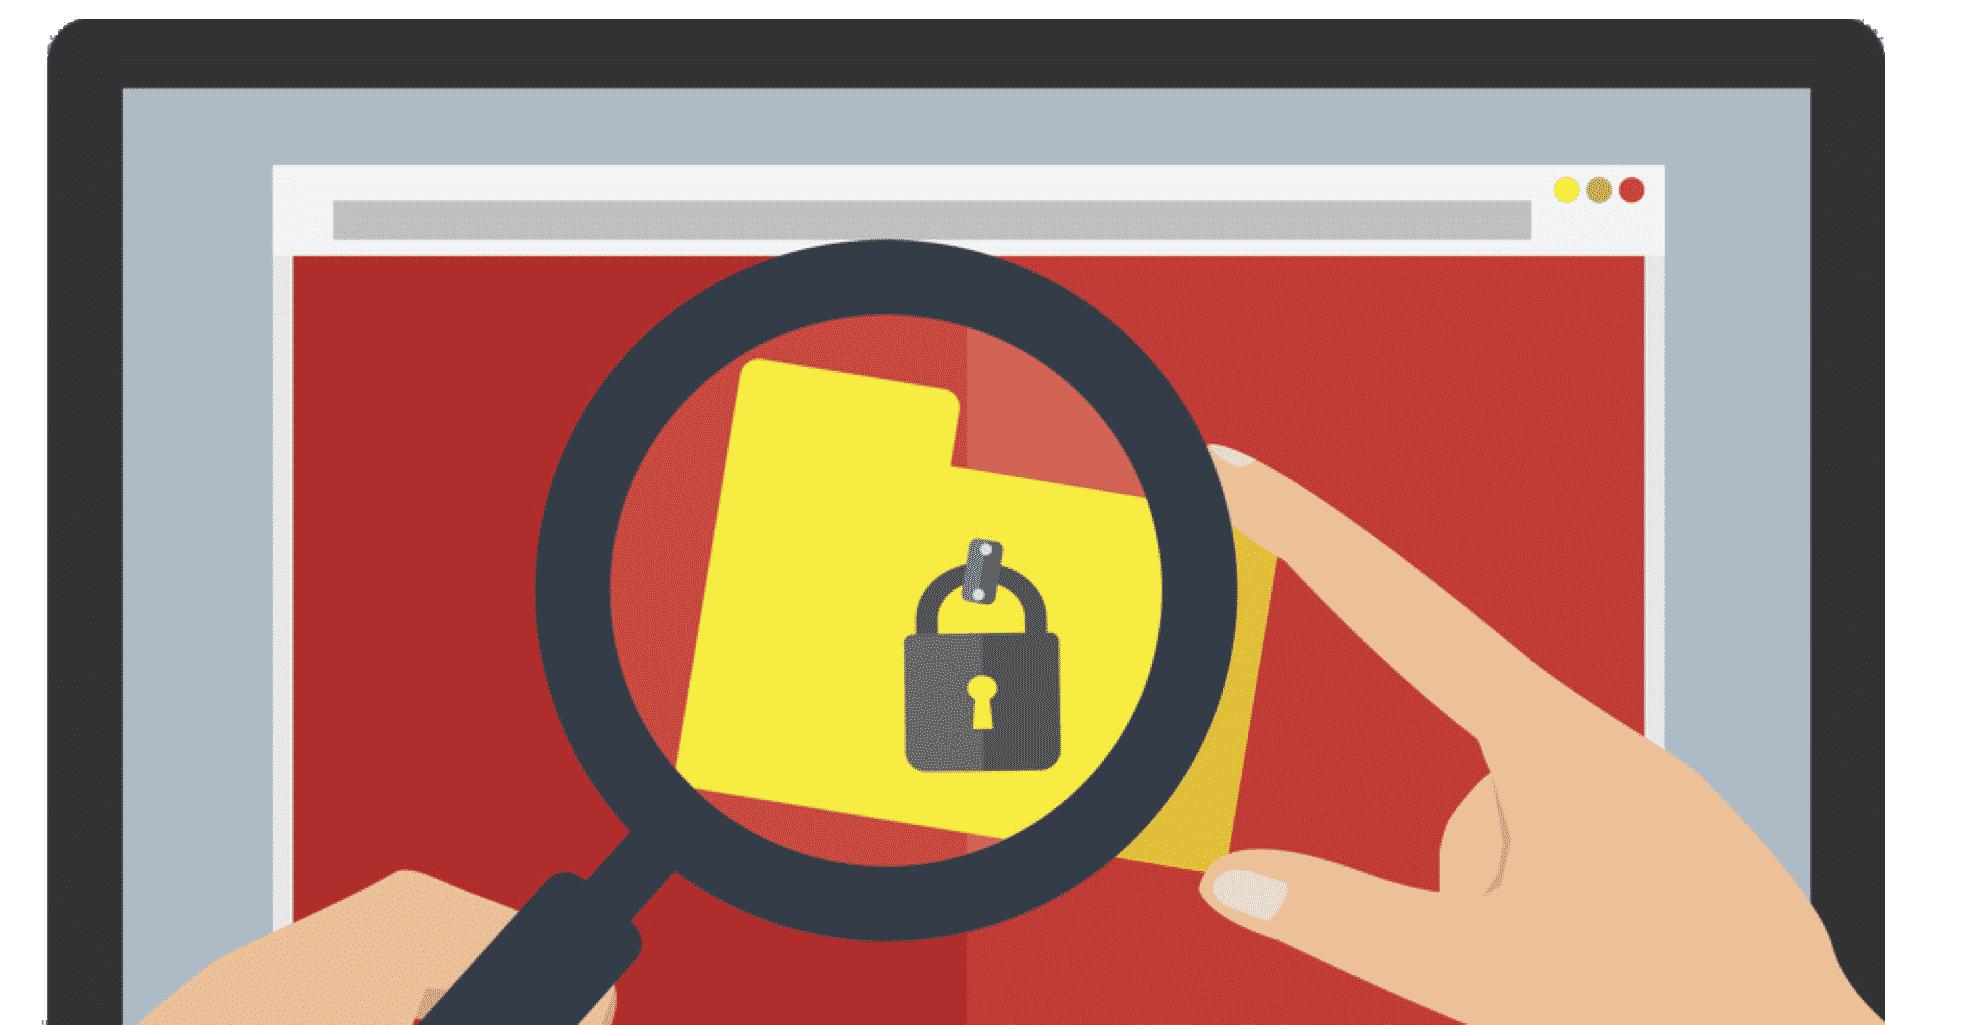 ransomware_computer كيفية إزالة تشفير الملفات بعد حذف فيروس WannaCry وفيروسات Ransomware